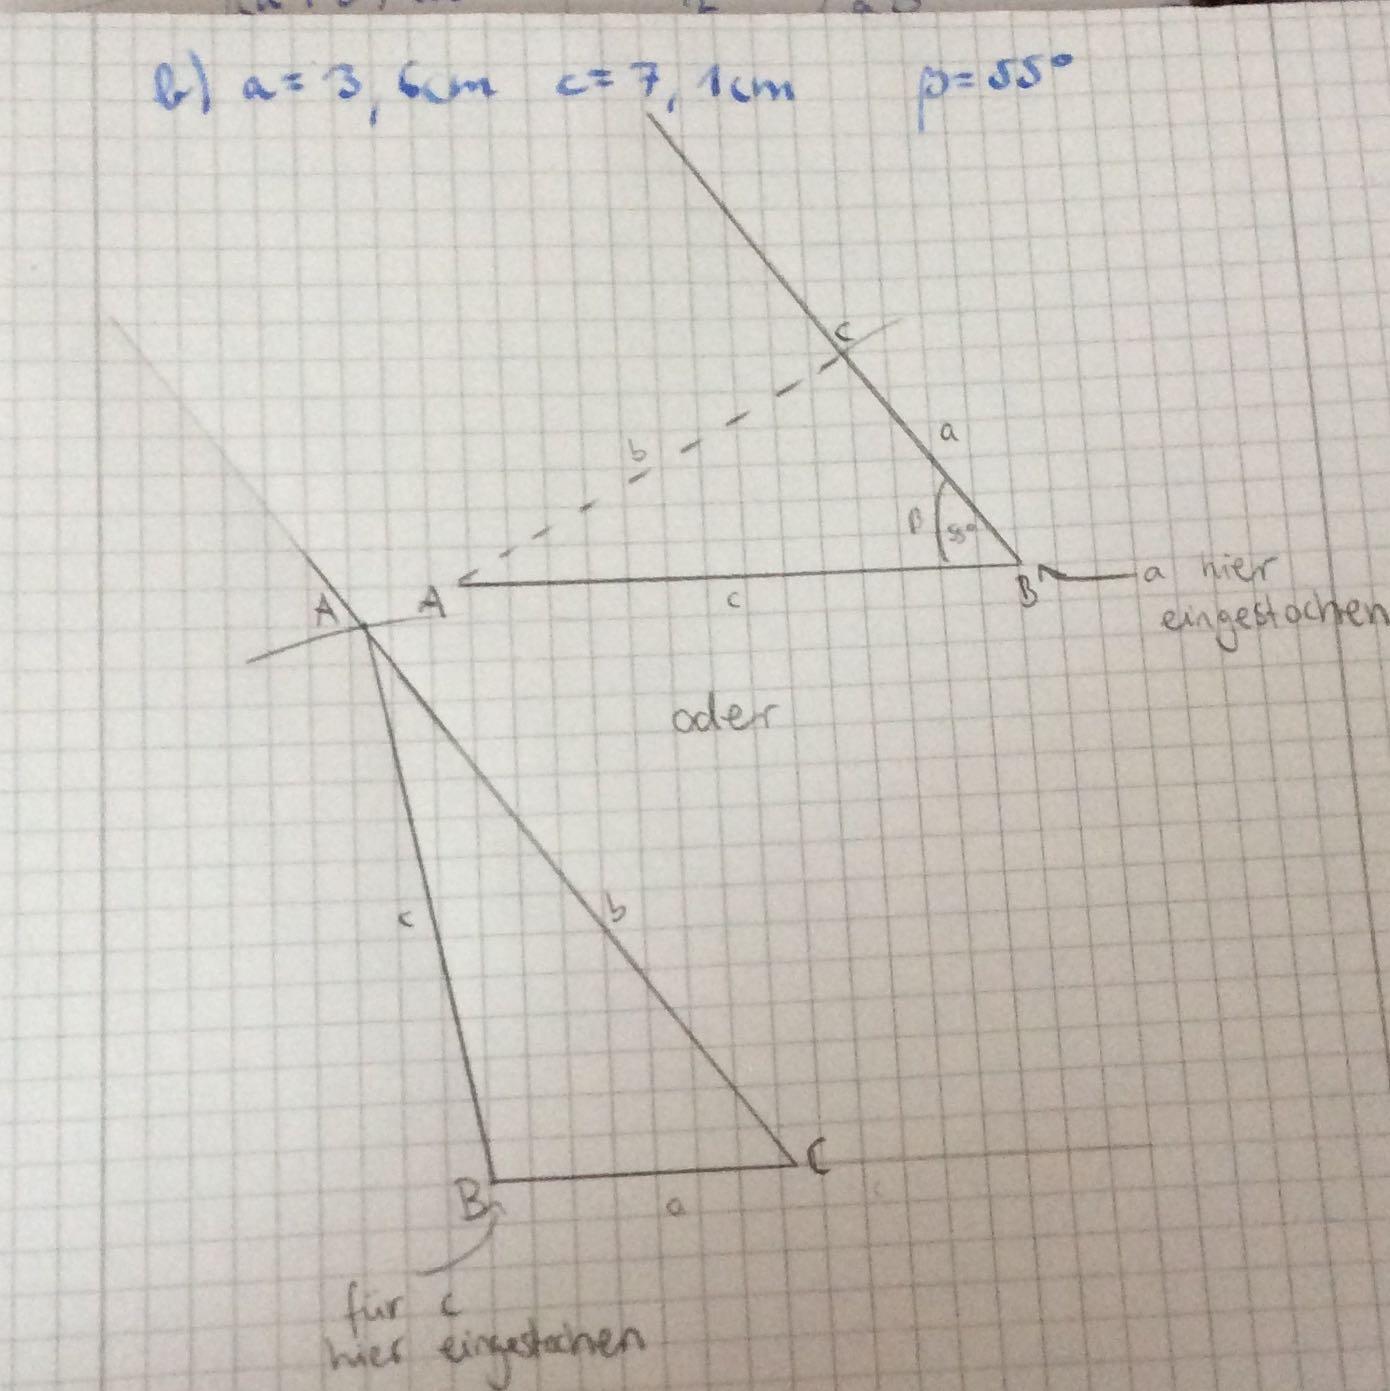 welches dreieck ist richtig dreiecke konstruieren kongruenzs tze mathe gymnasium abc. Black Bedroom Furniture Sets. Home Design Ideas